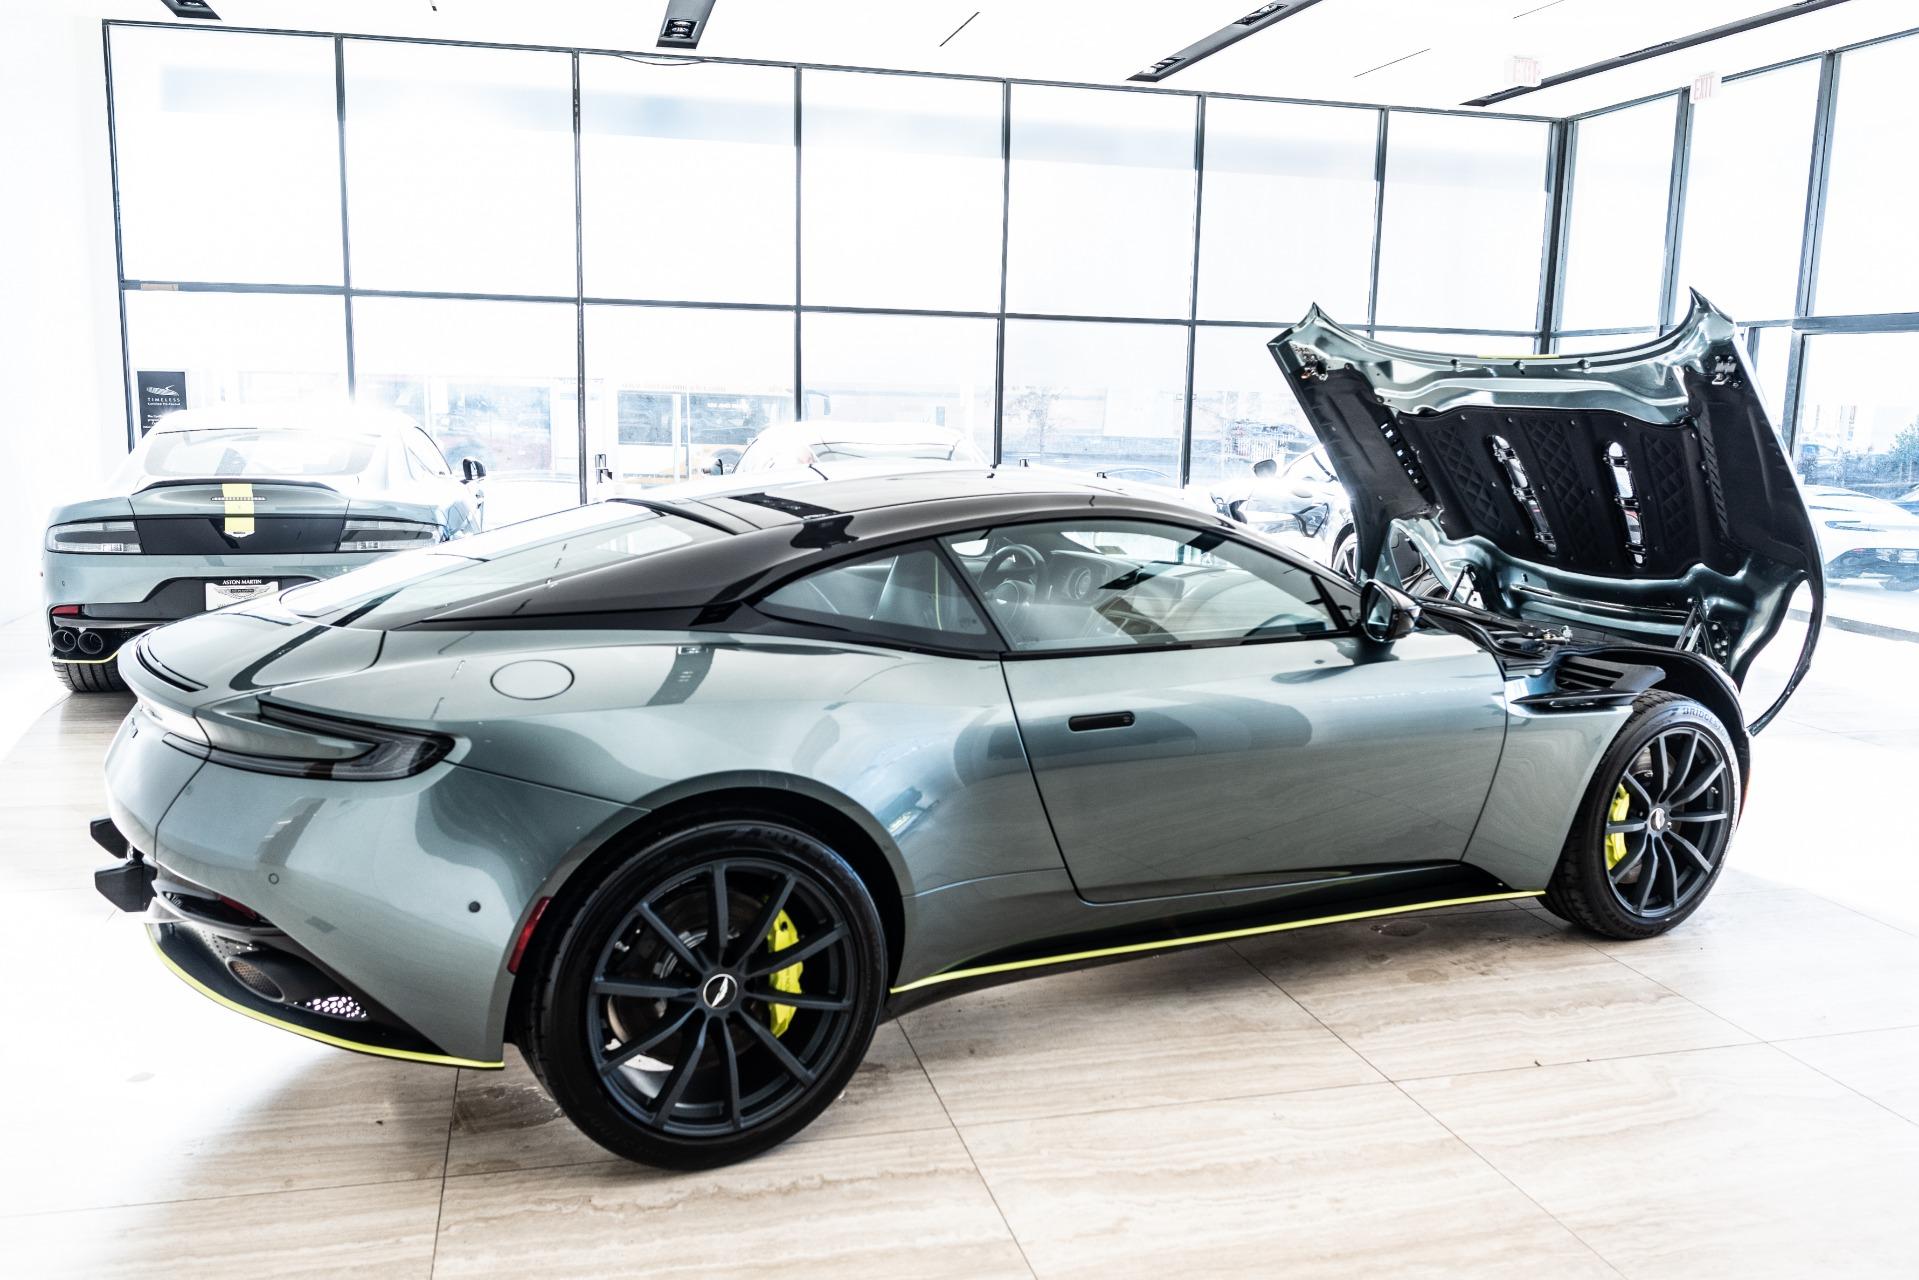 2019 Aston Martin Db11 Amr Stock 9nl06355 For Sale Near Vienna Va